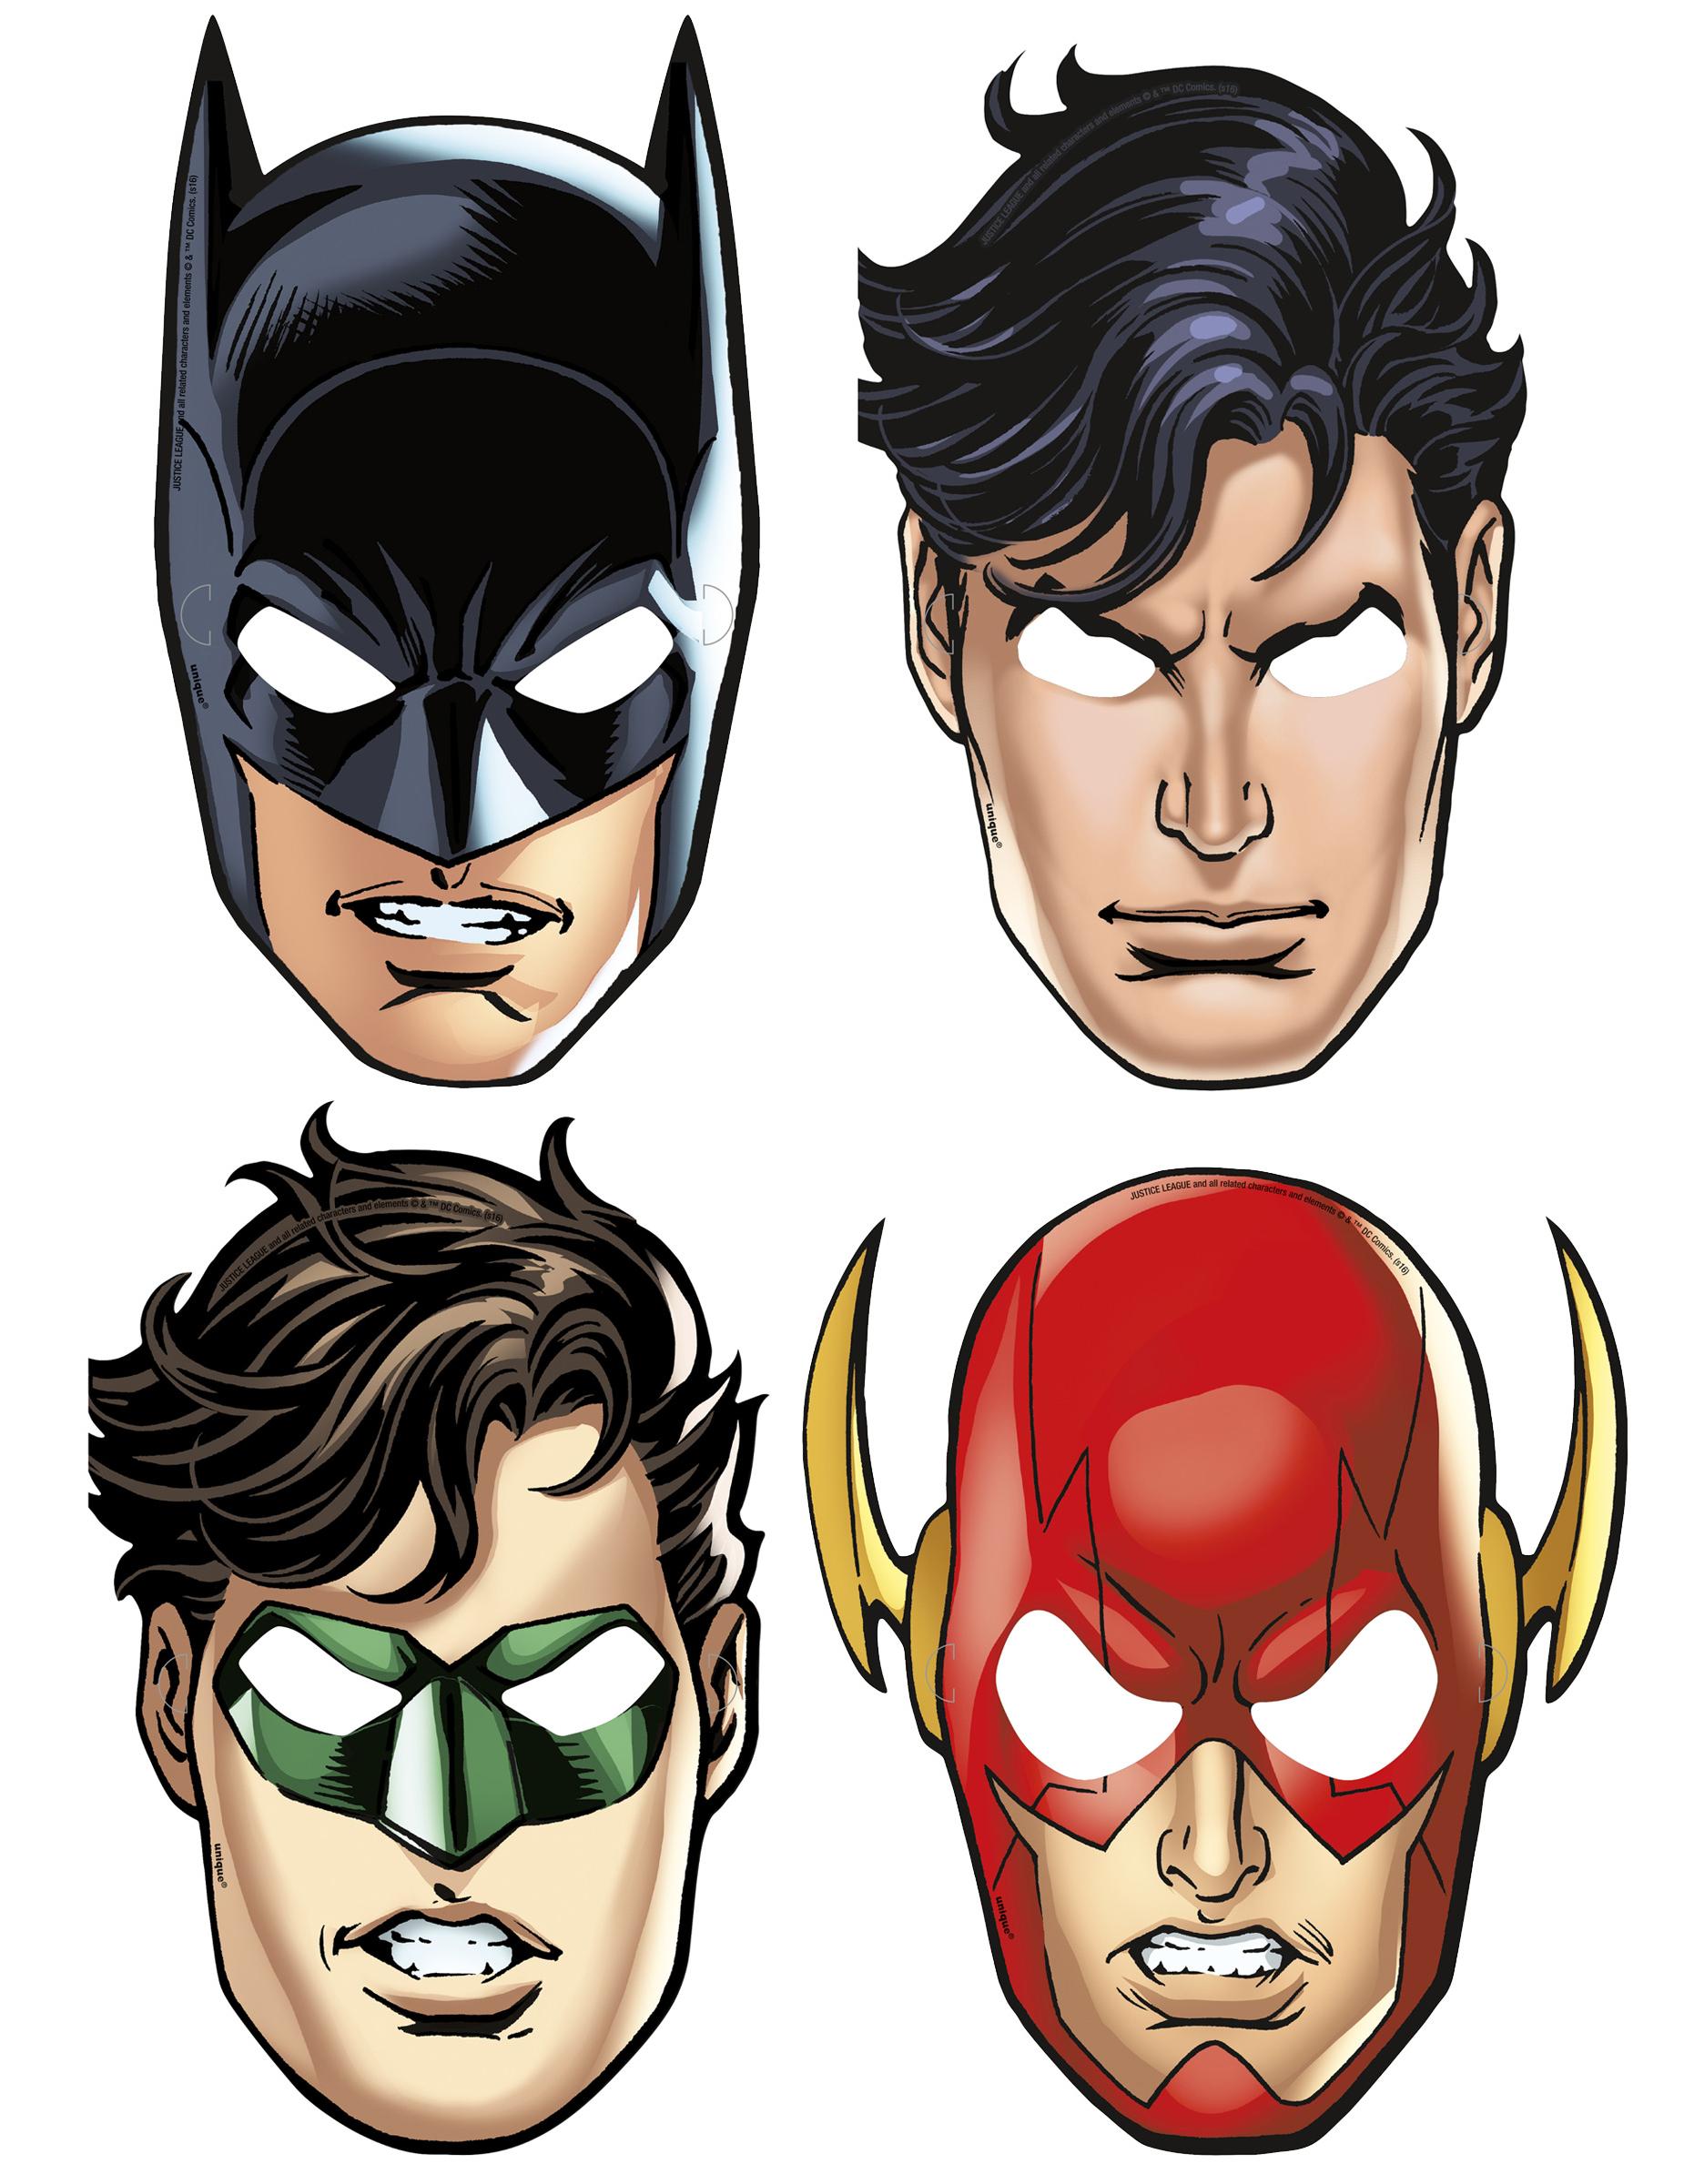 Maschere in cartone justice league™ e vestiti